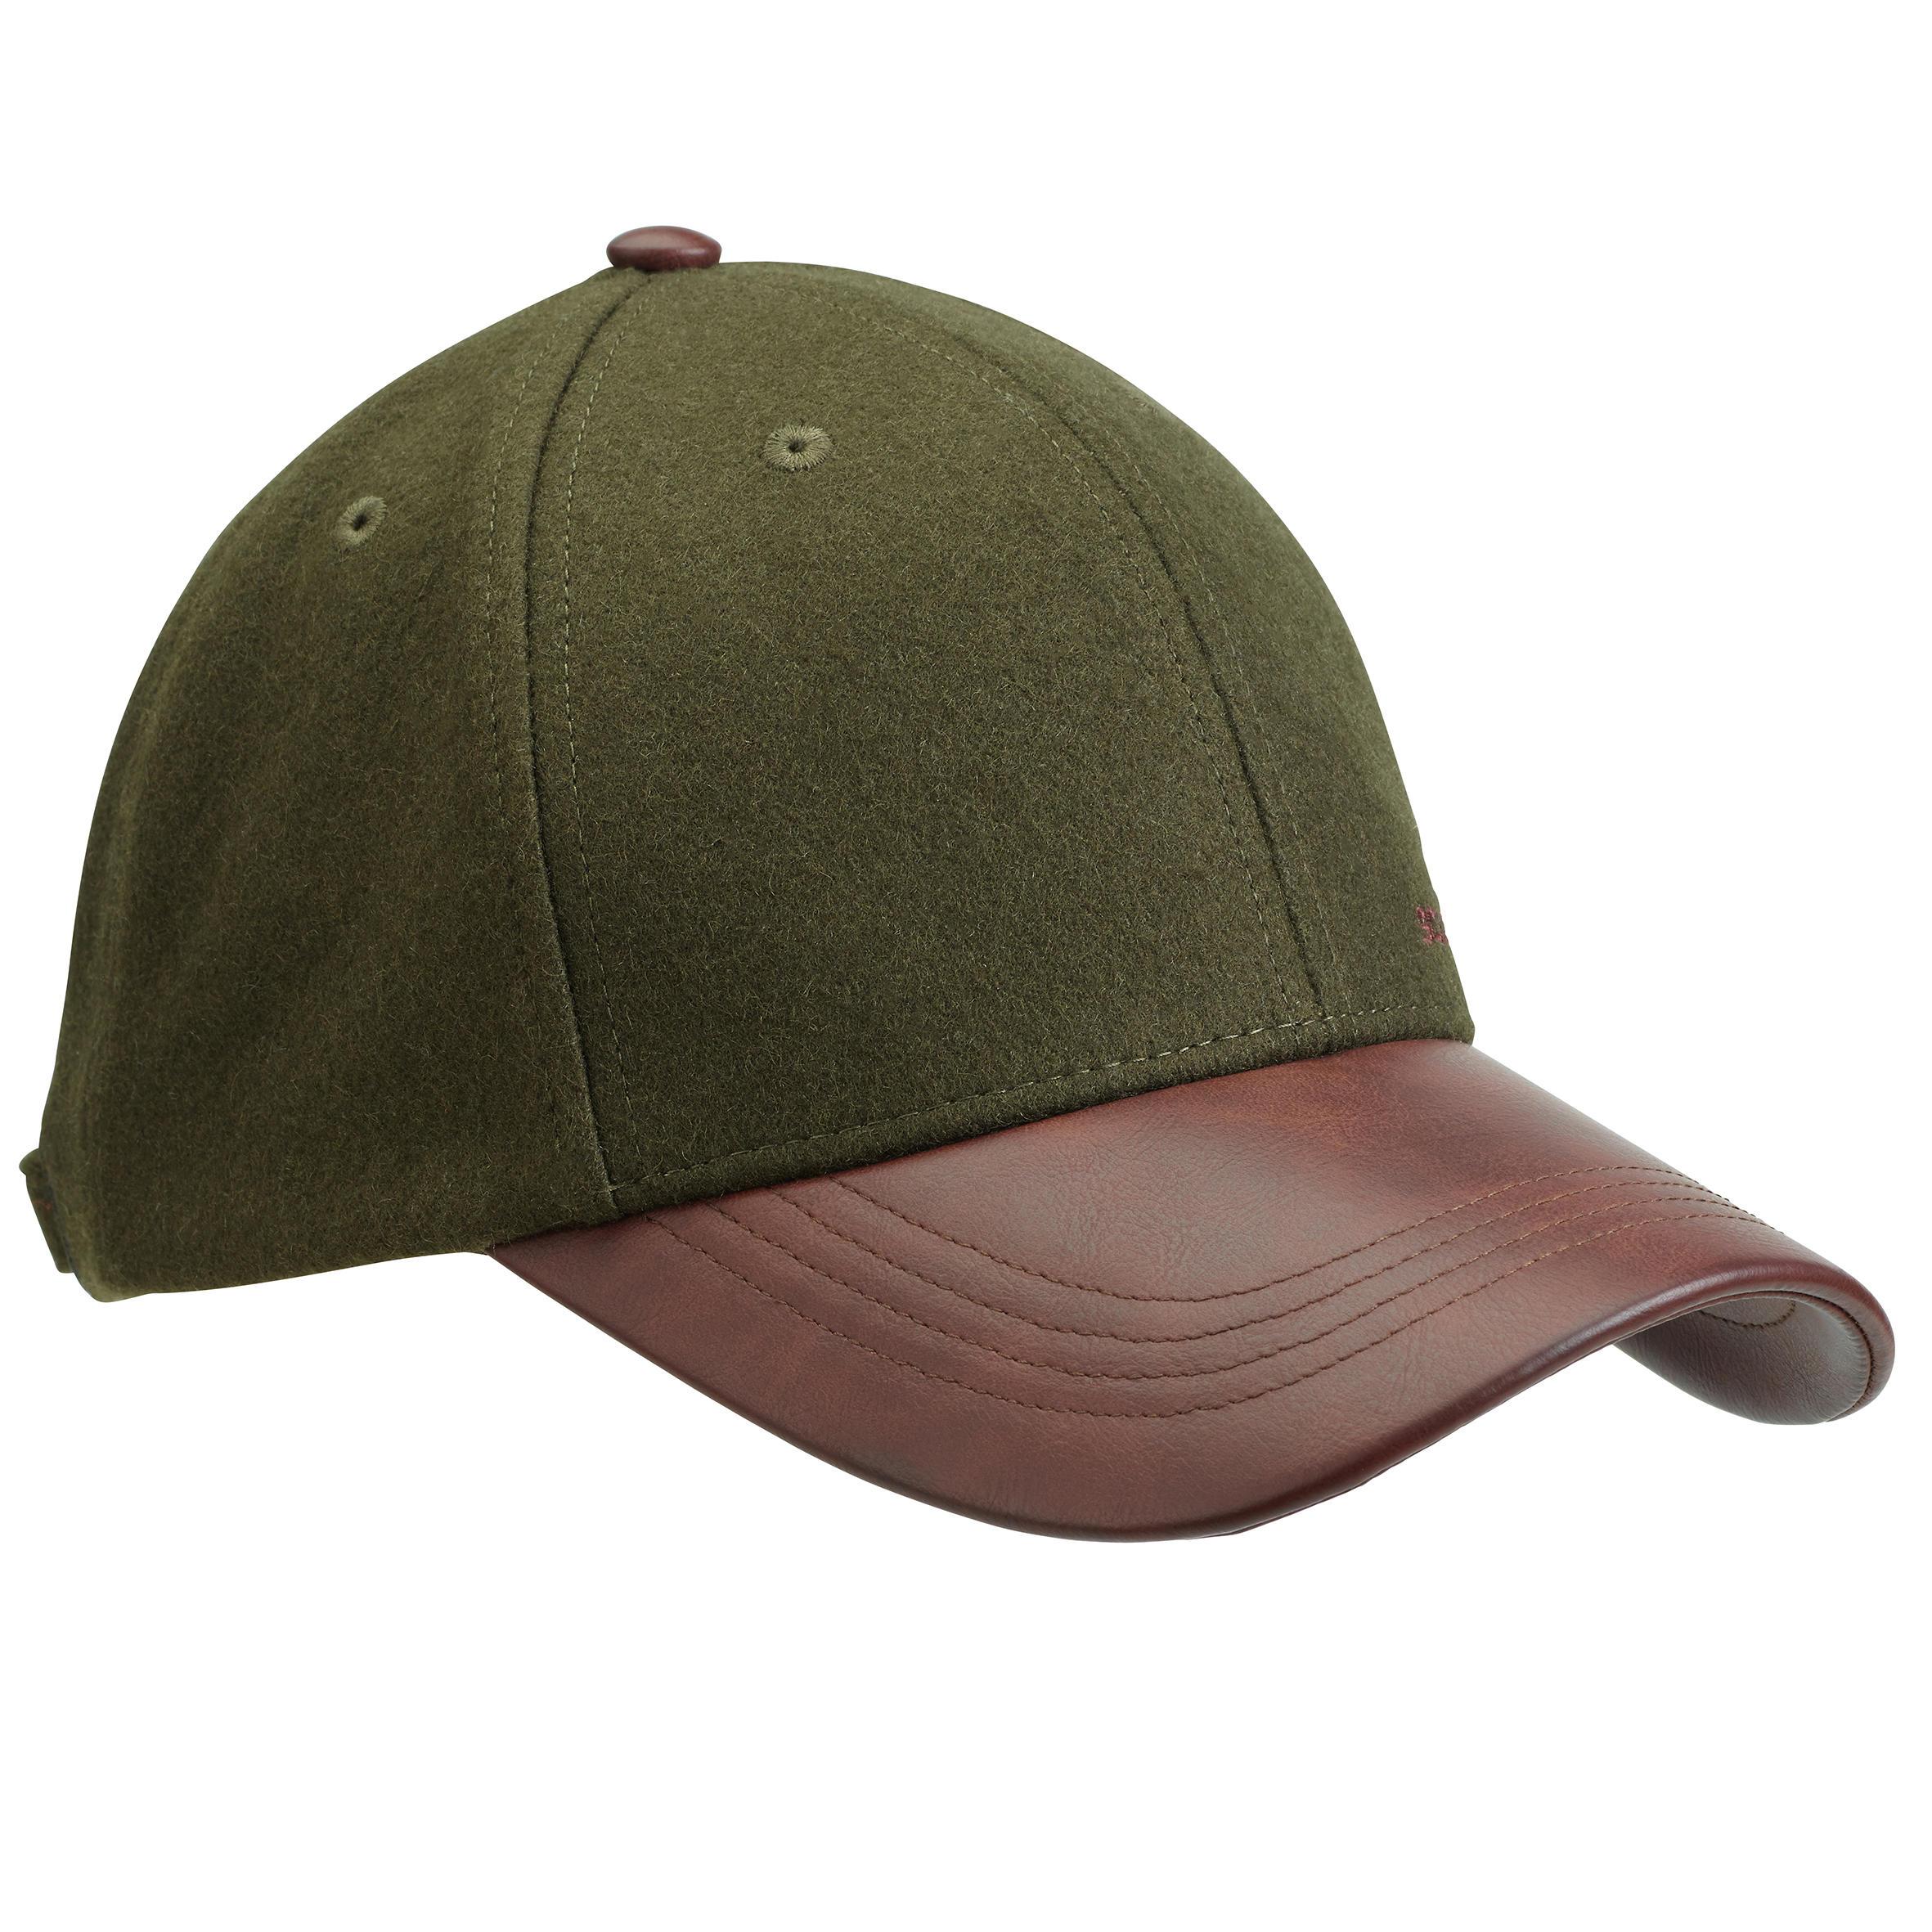 Șapcă SG520 maro şi verde imagine